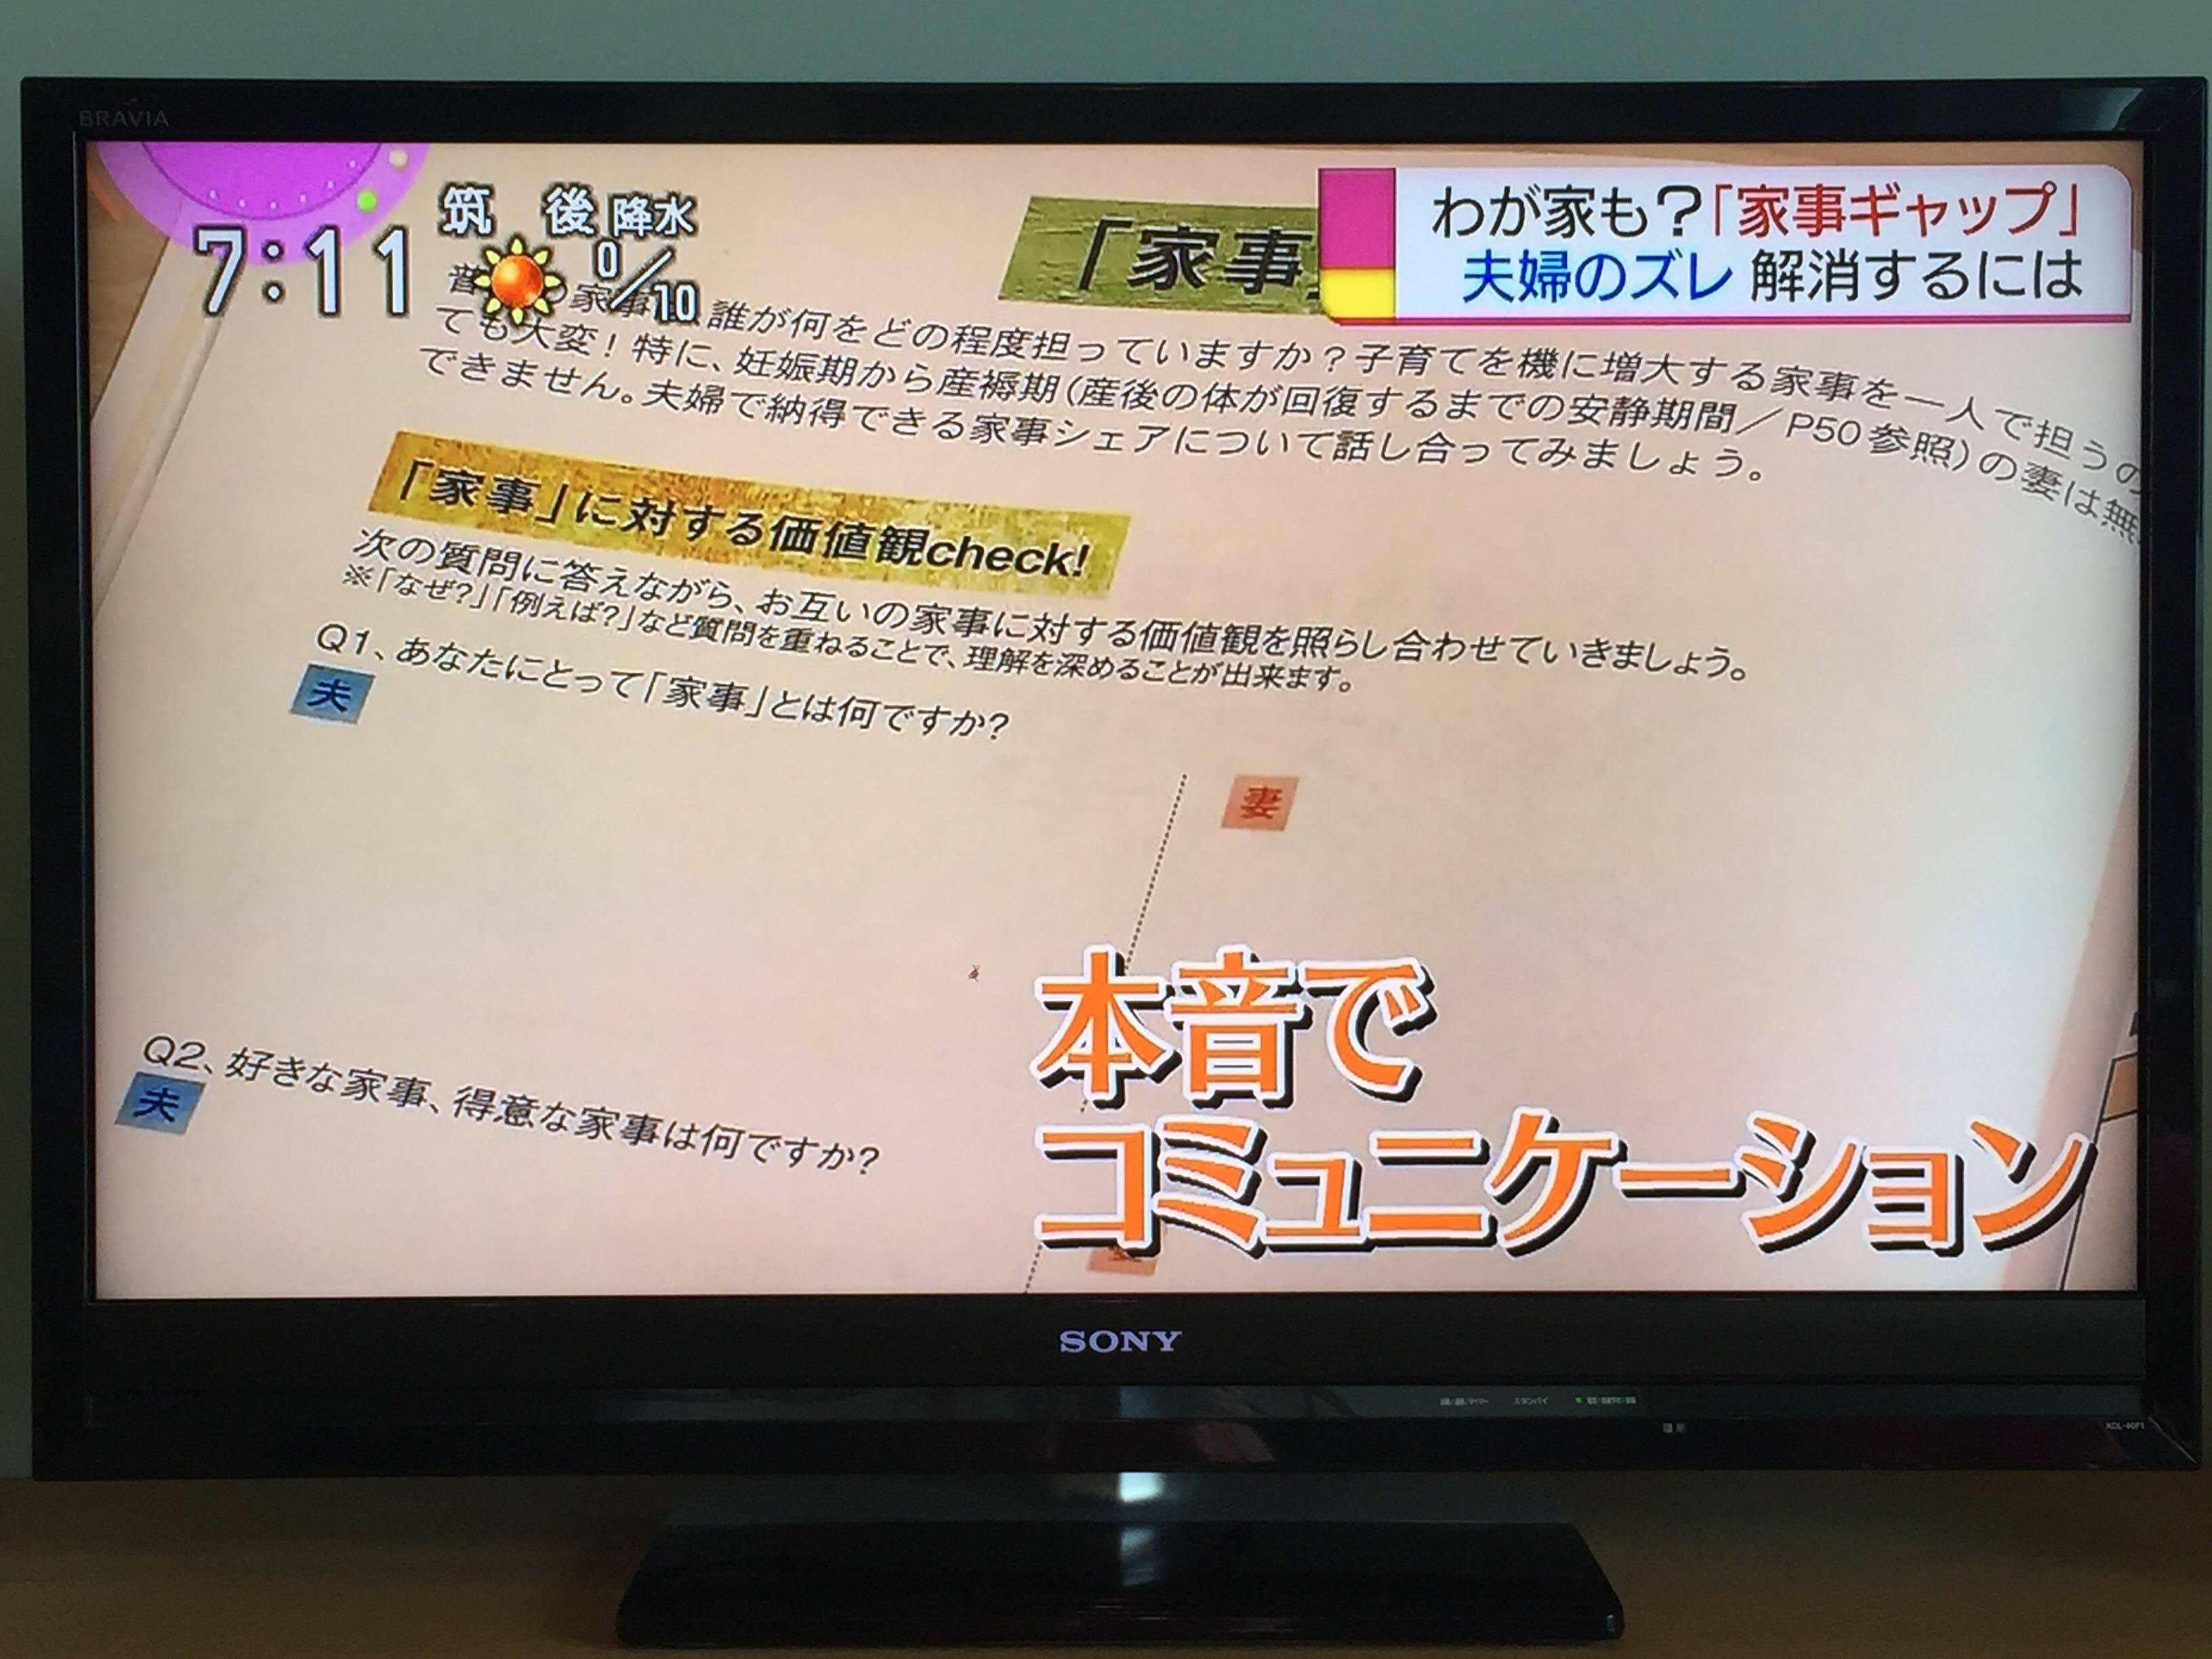 NHK全国放送「おはよう日本」家事ギャップで、夫婦会議ツール「世帯経営ノート」をご紹介いただきました